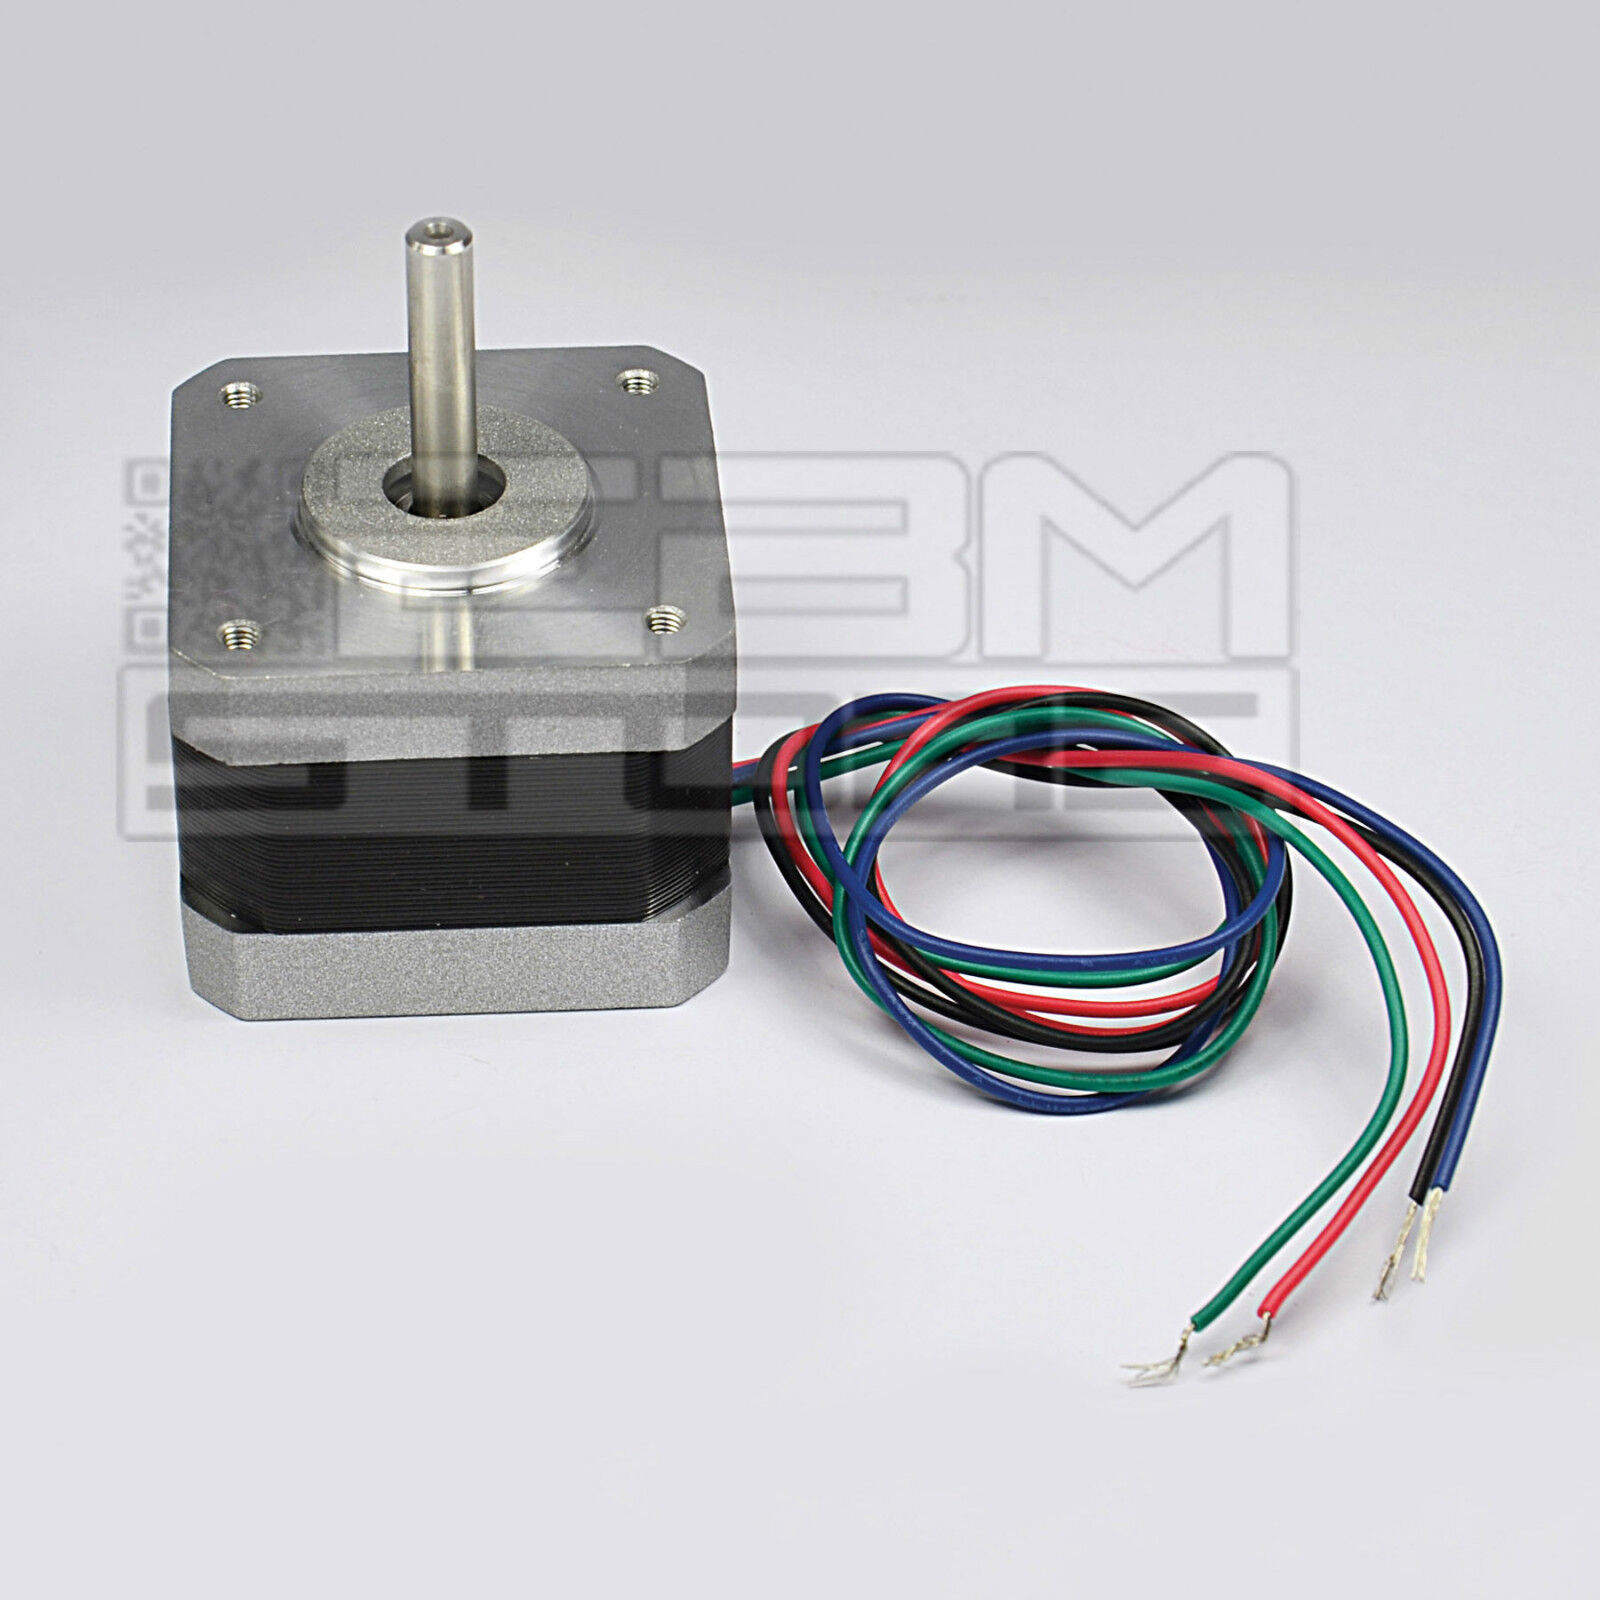 Motore passo passo NEMA 17 stepper motor arduino rep rap - ART. CN01